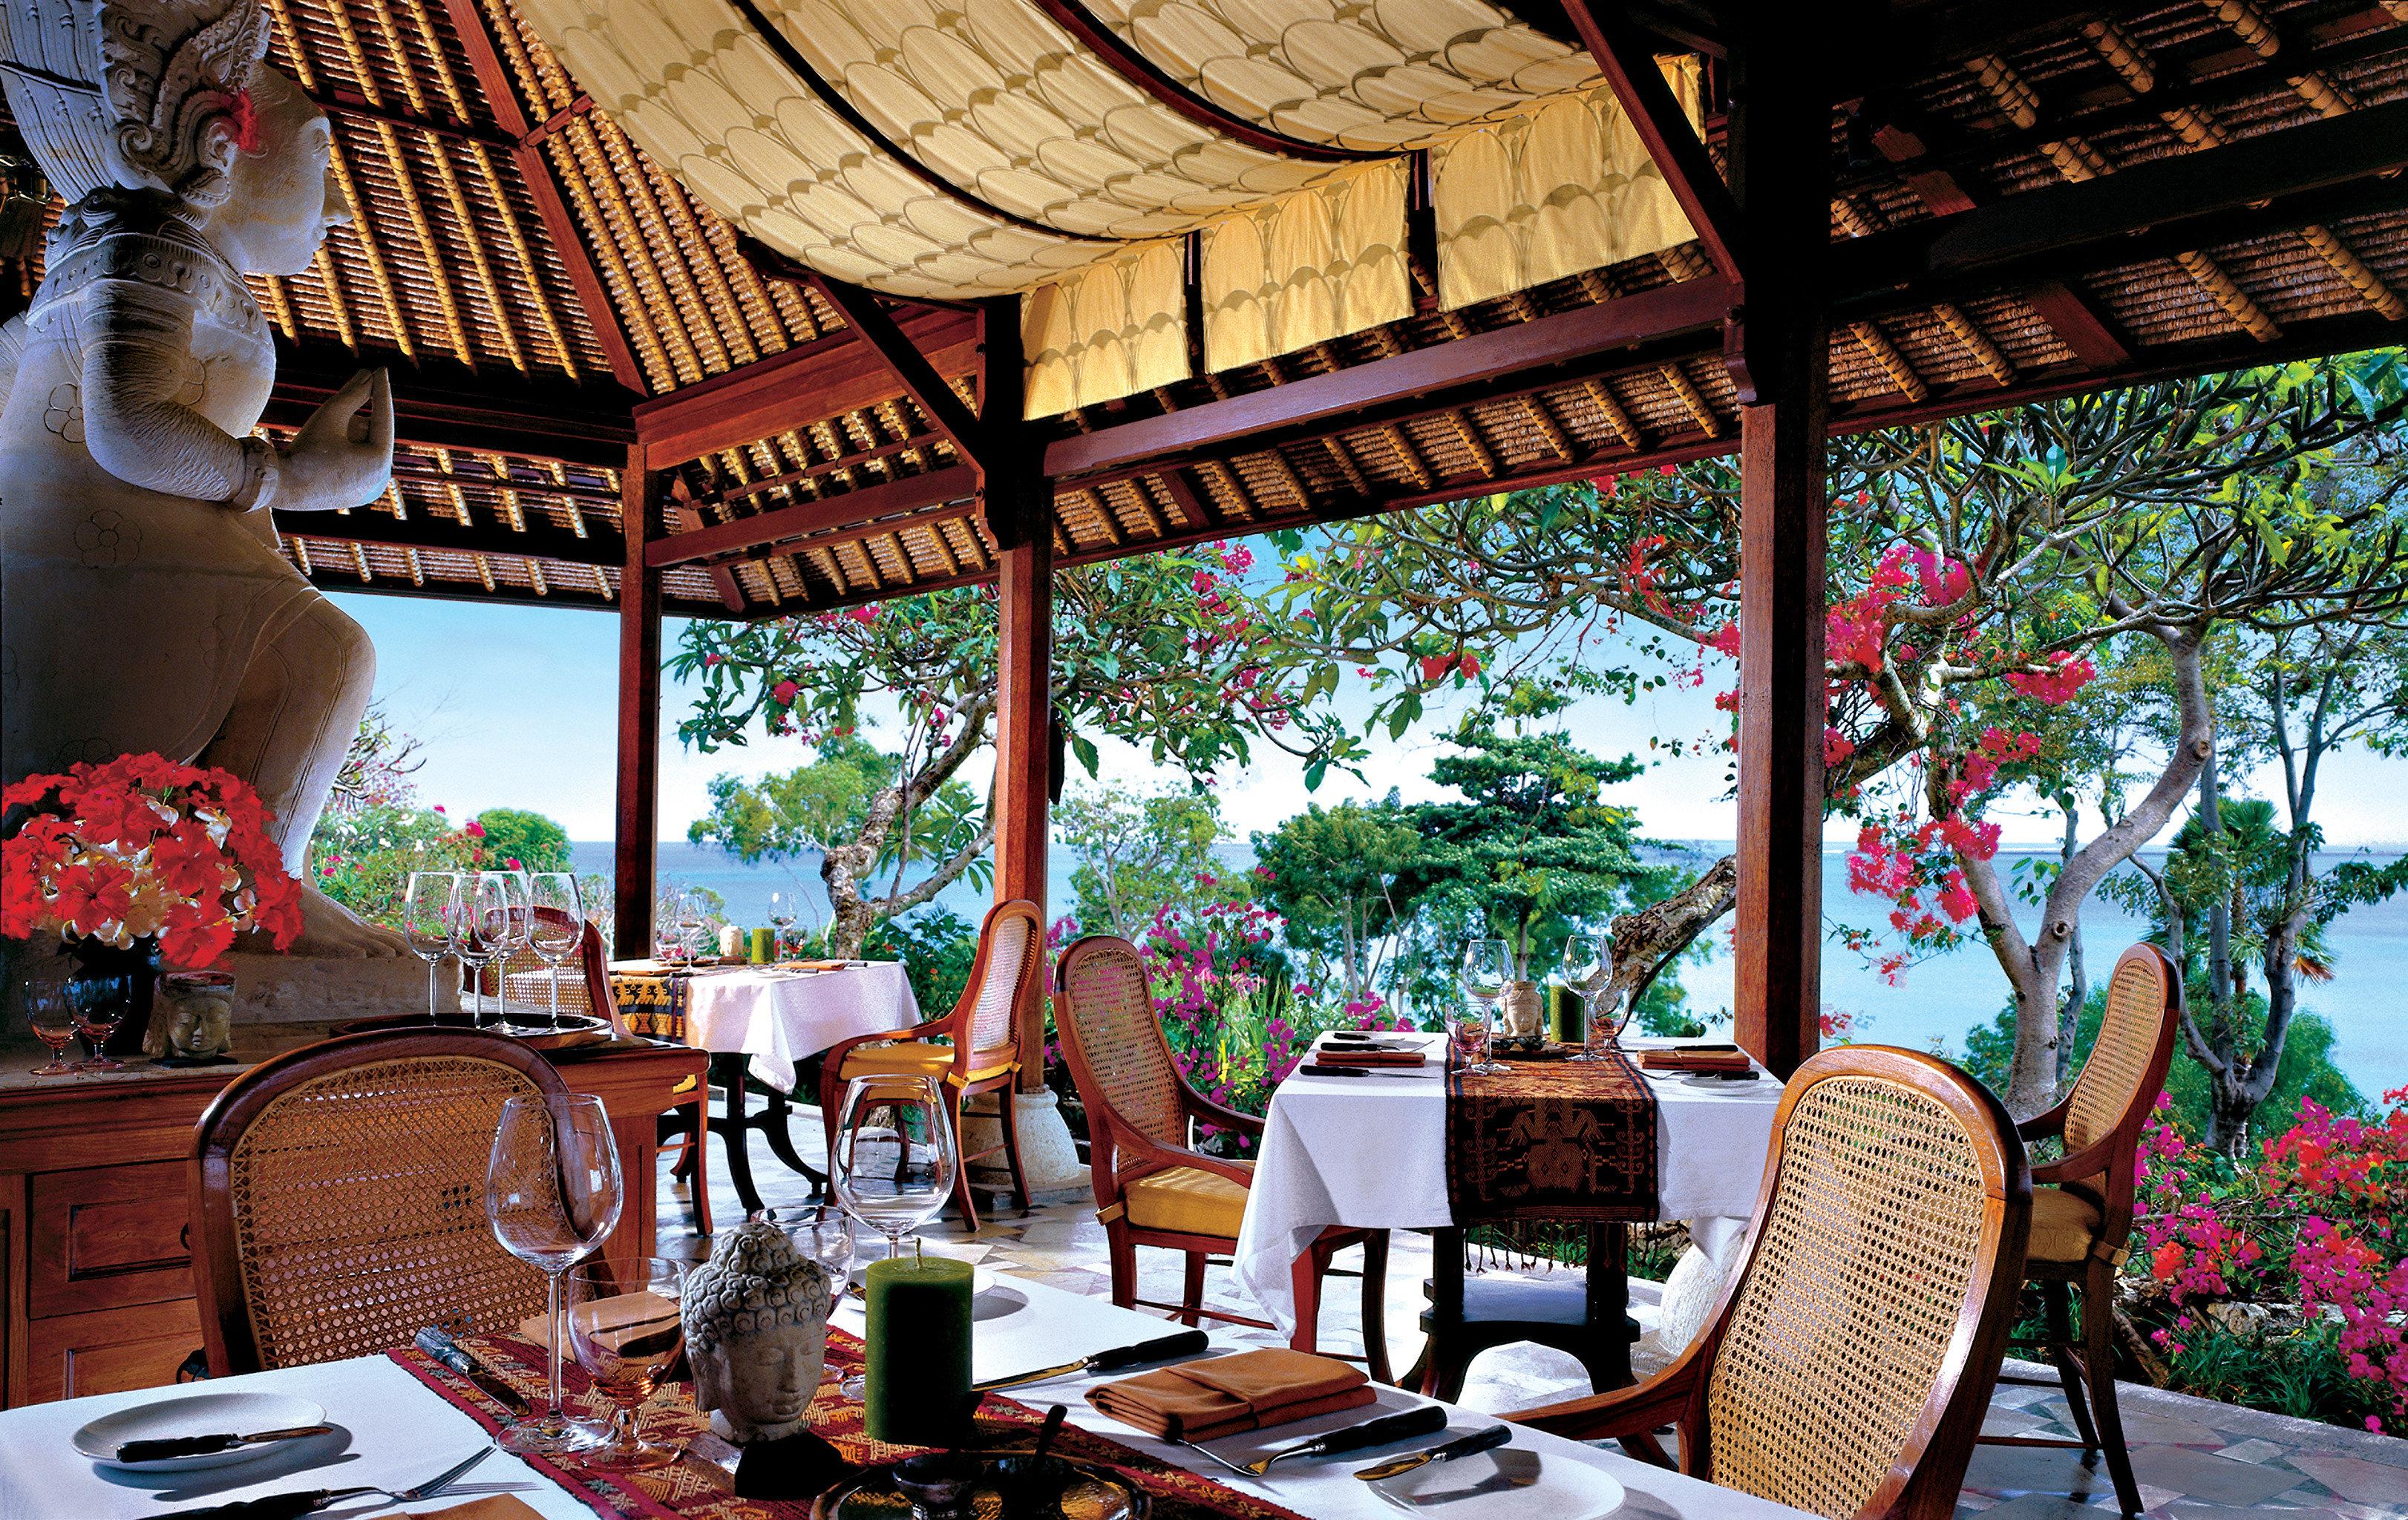 Bar Dining Drink Eat Hip Luxury Modern Ocean chair Resort restaurant home outdoor structure